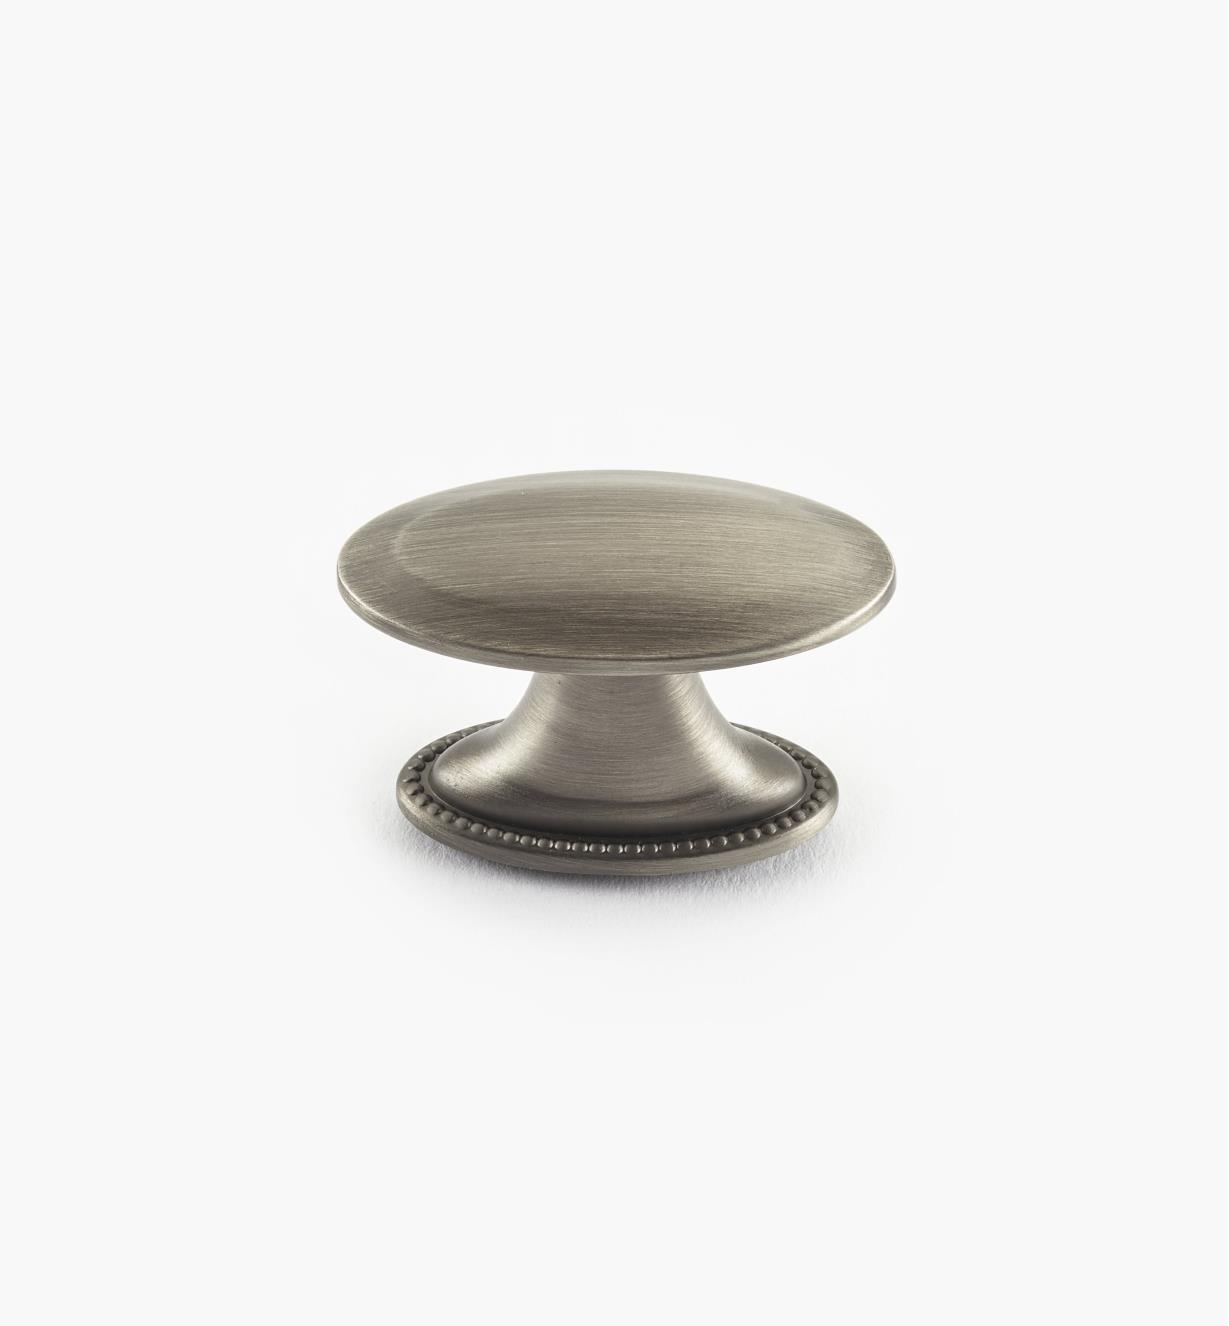 02A1561 - Bouton ovale Atherly, fini argent antique, 1 1/2 po x 3/4 po